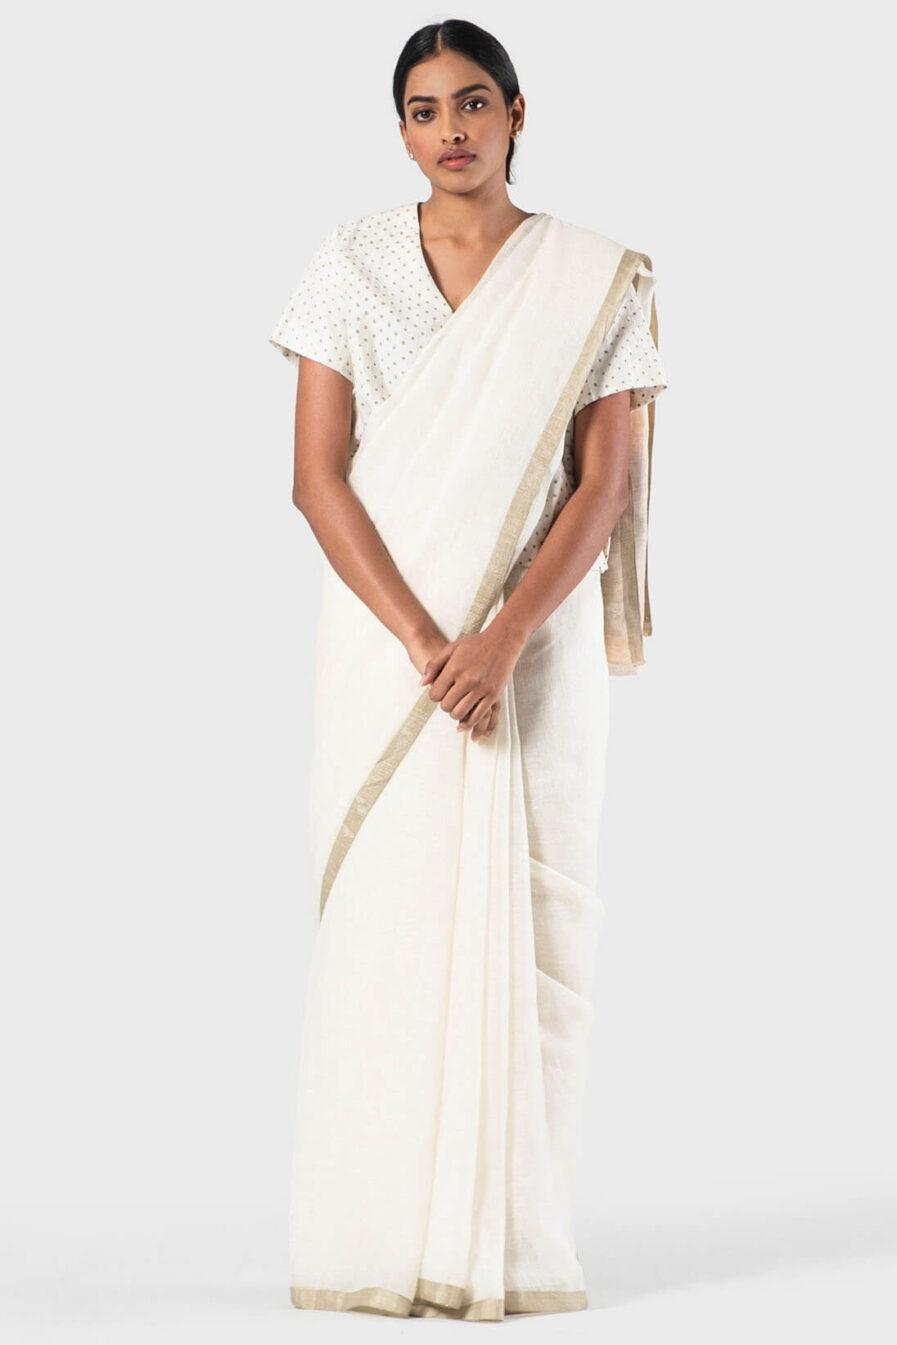 Anavila Ivory basic zari white sari